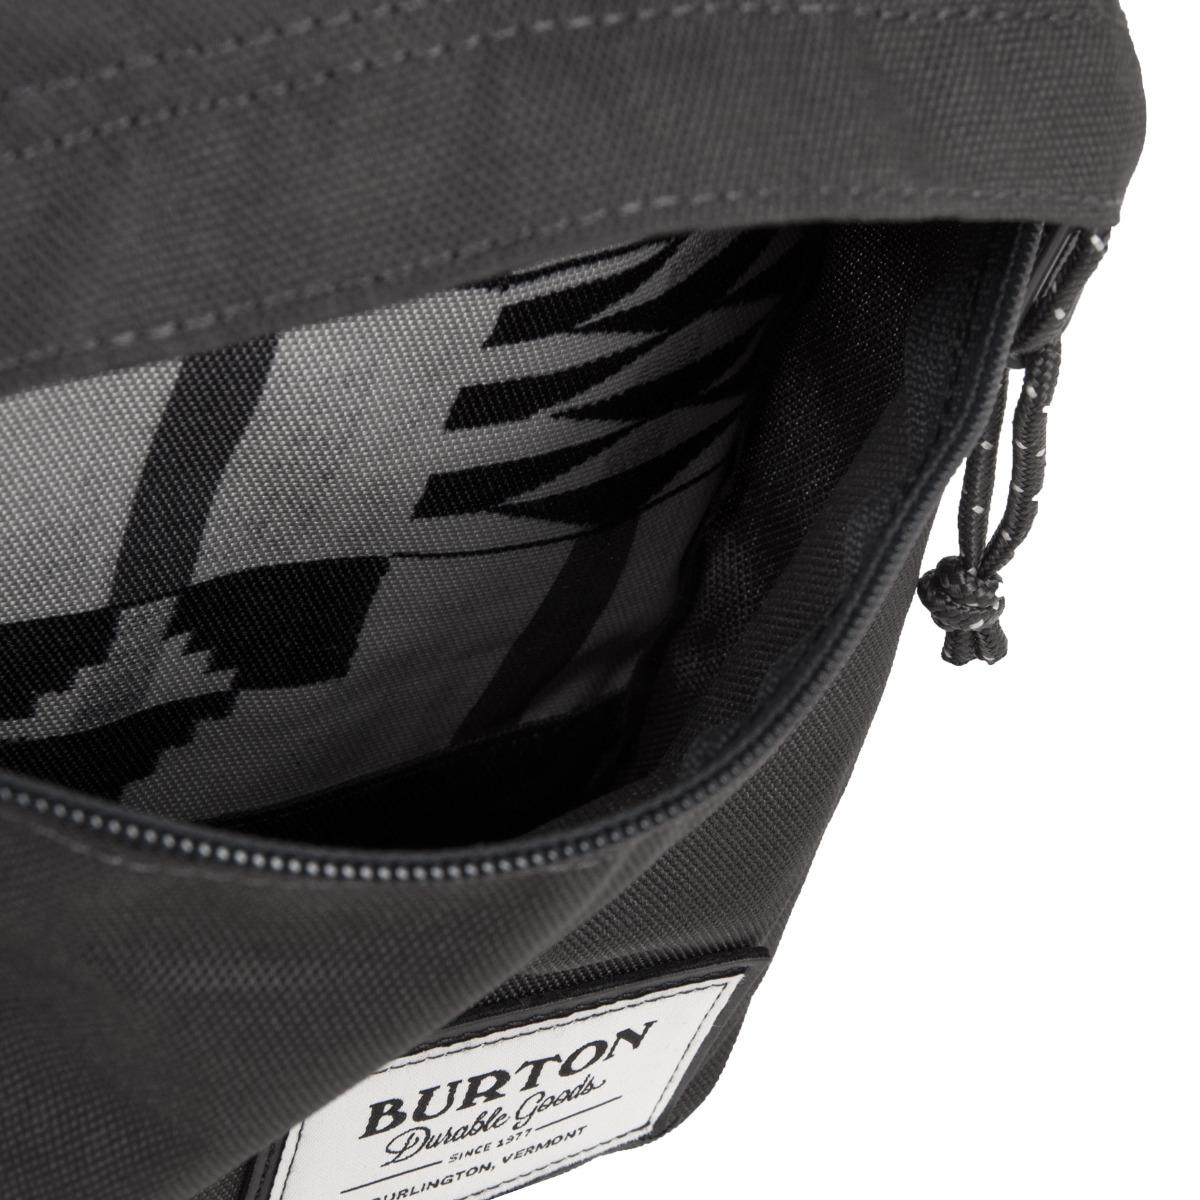 Burton Kettle Pack Pelican Brickstripe.